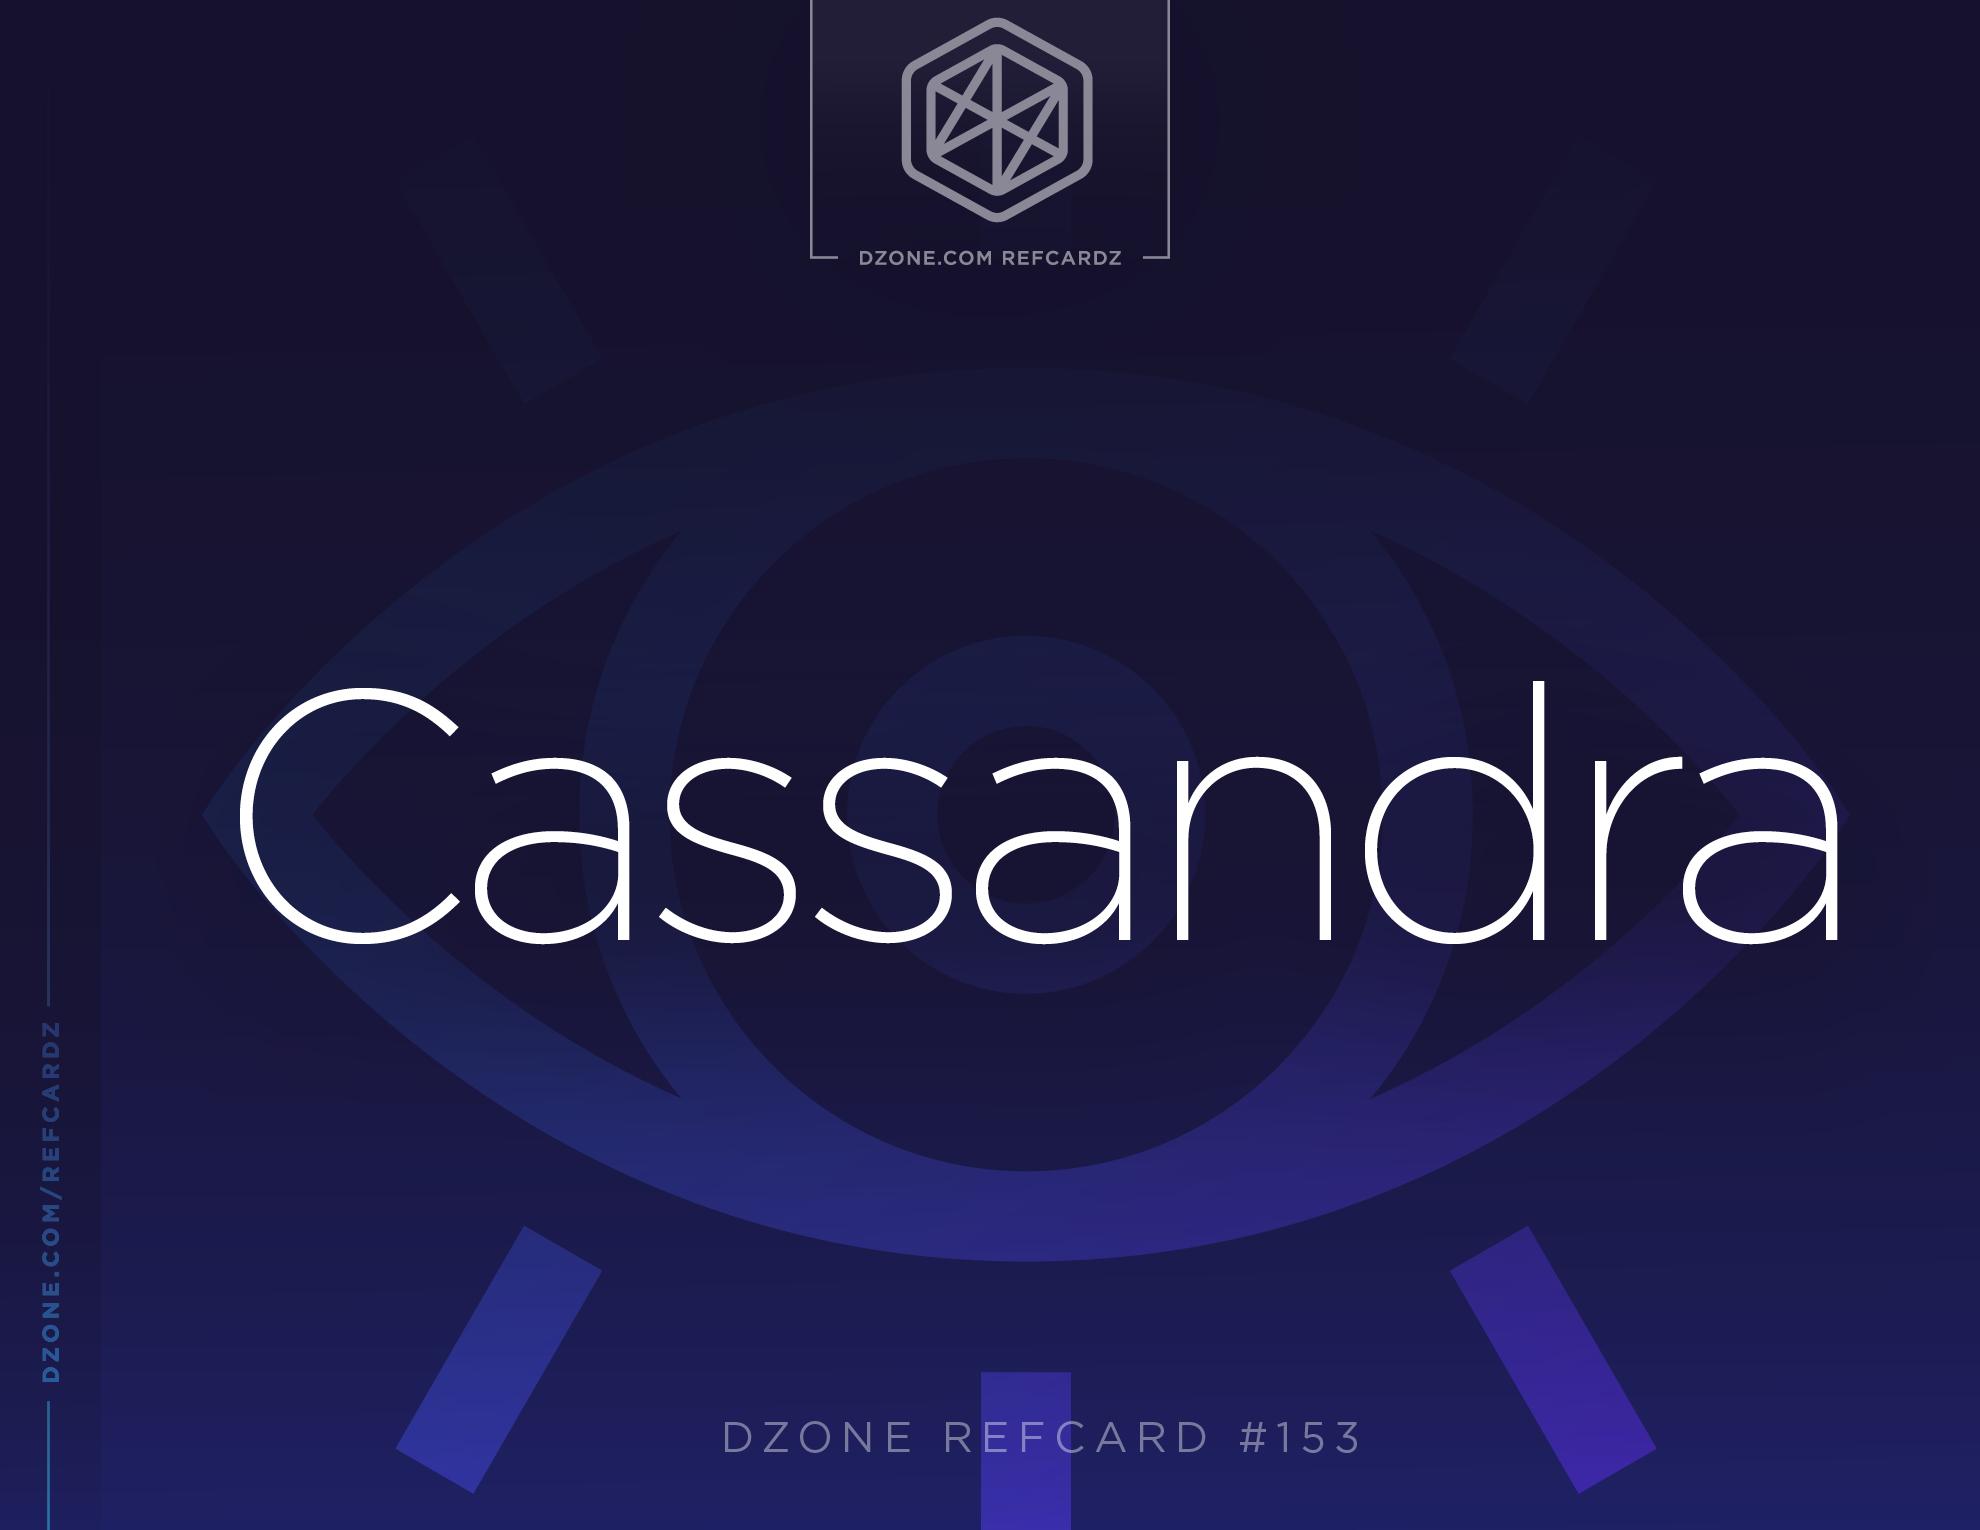 Cassandra Tutorial Pdf